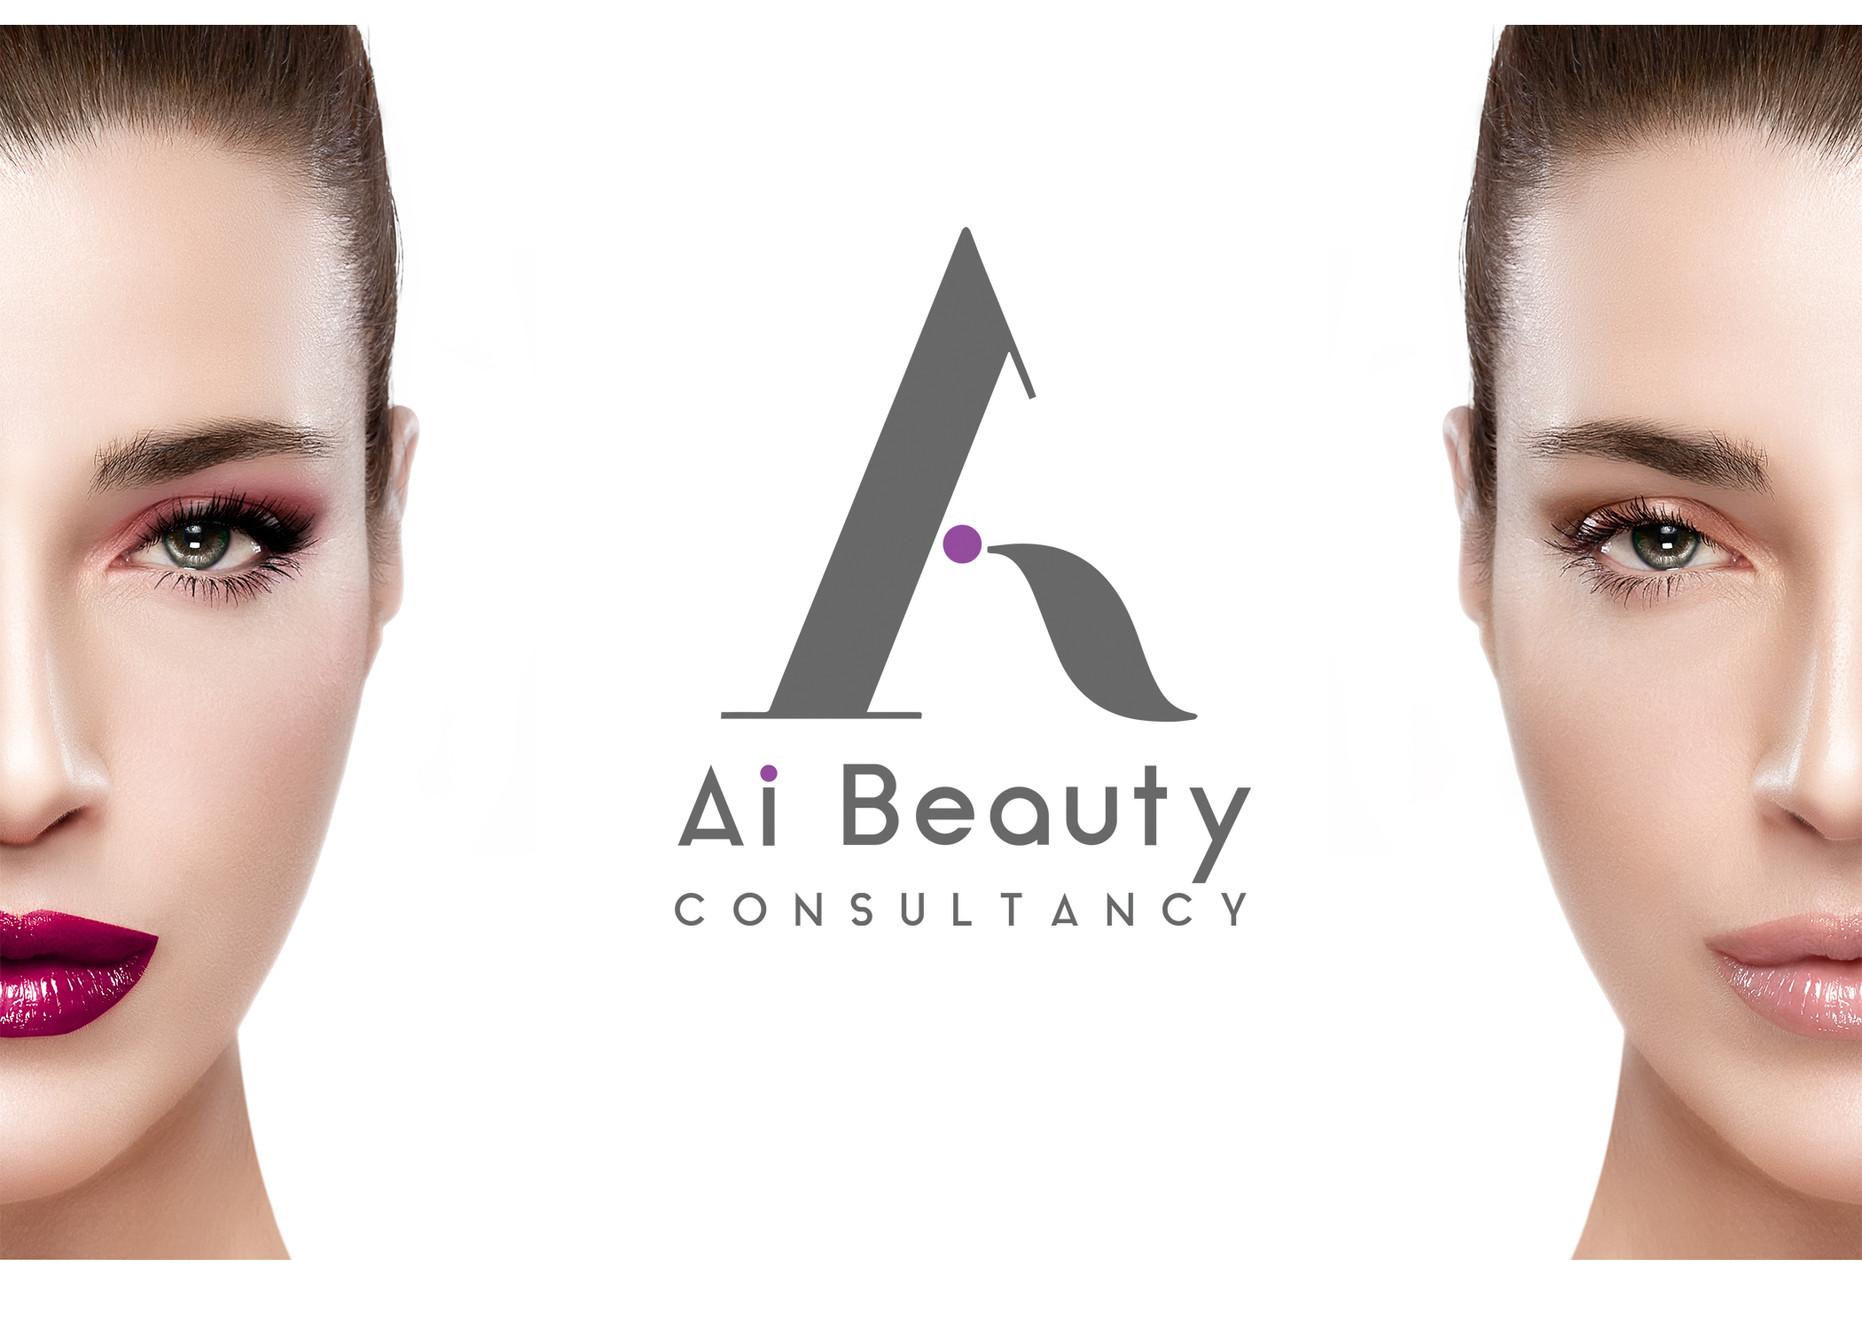 Ai Beauty - Expert Beauty Consultancy